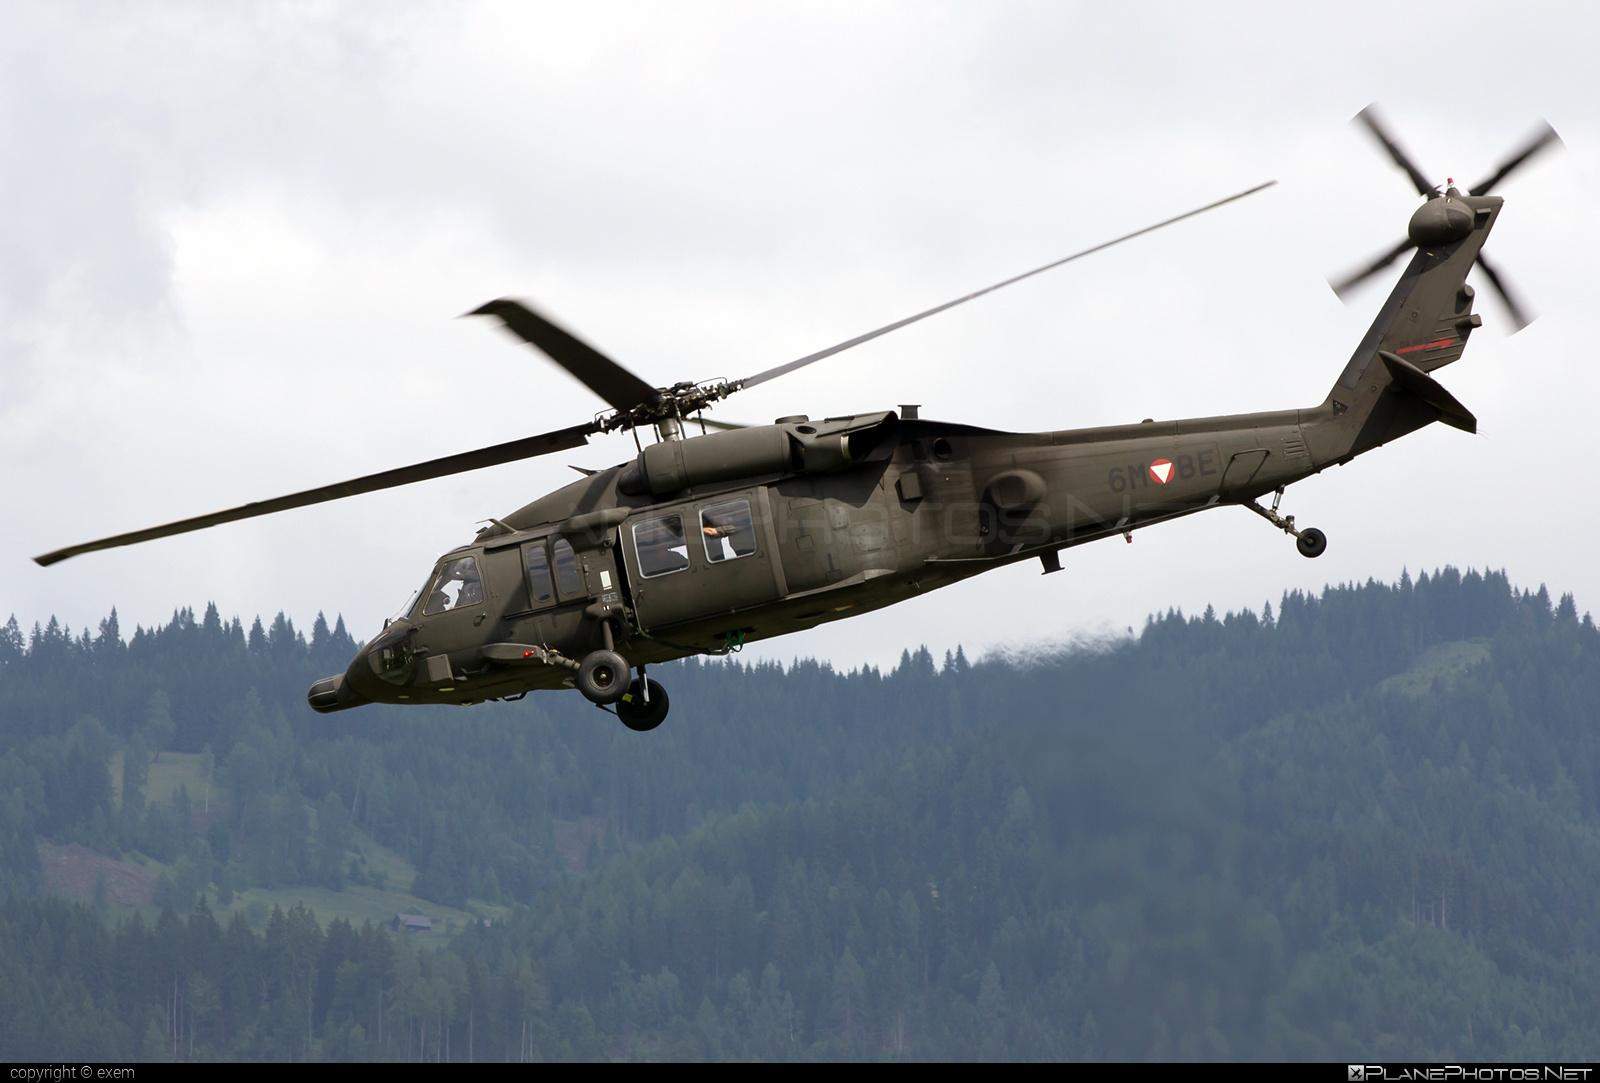 Sikorsky S-70A-42 Black Hawk - 6M-BE operated by Österreichische Luftstreitkräfte (Austrian Air Force) #airpower #airpower2013 #austrianairforce #sikorsky